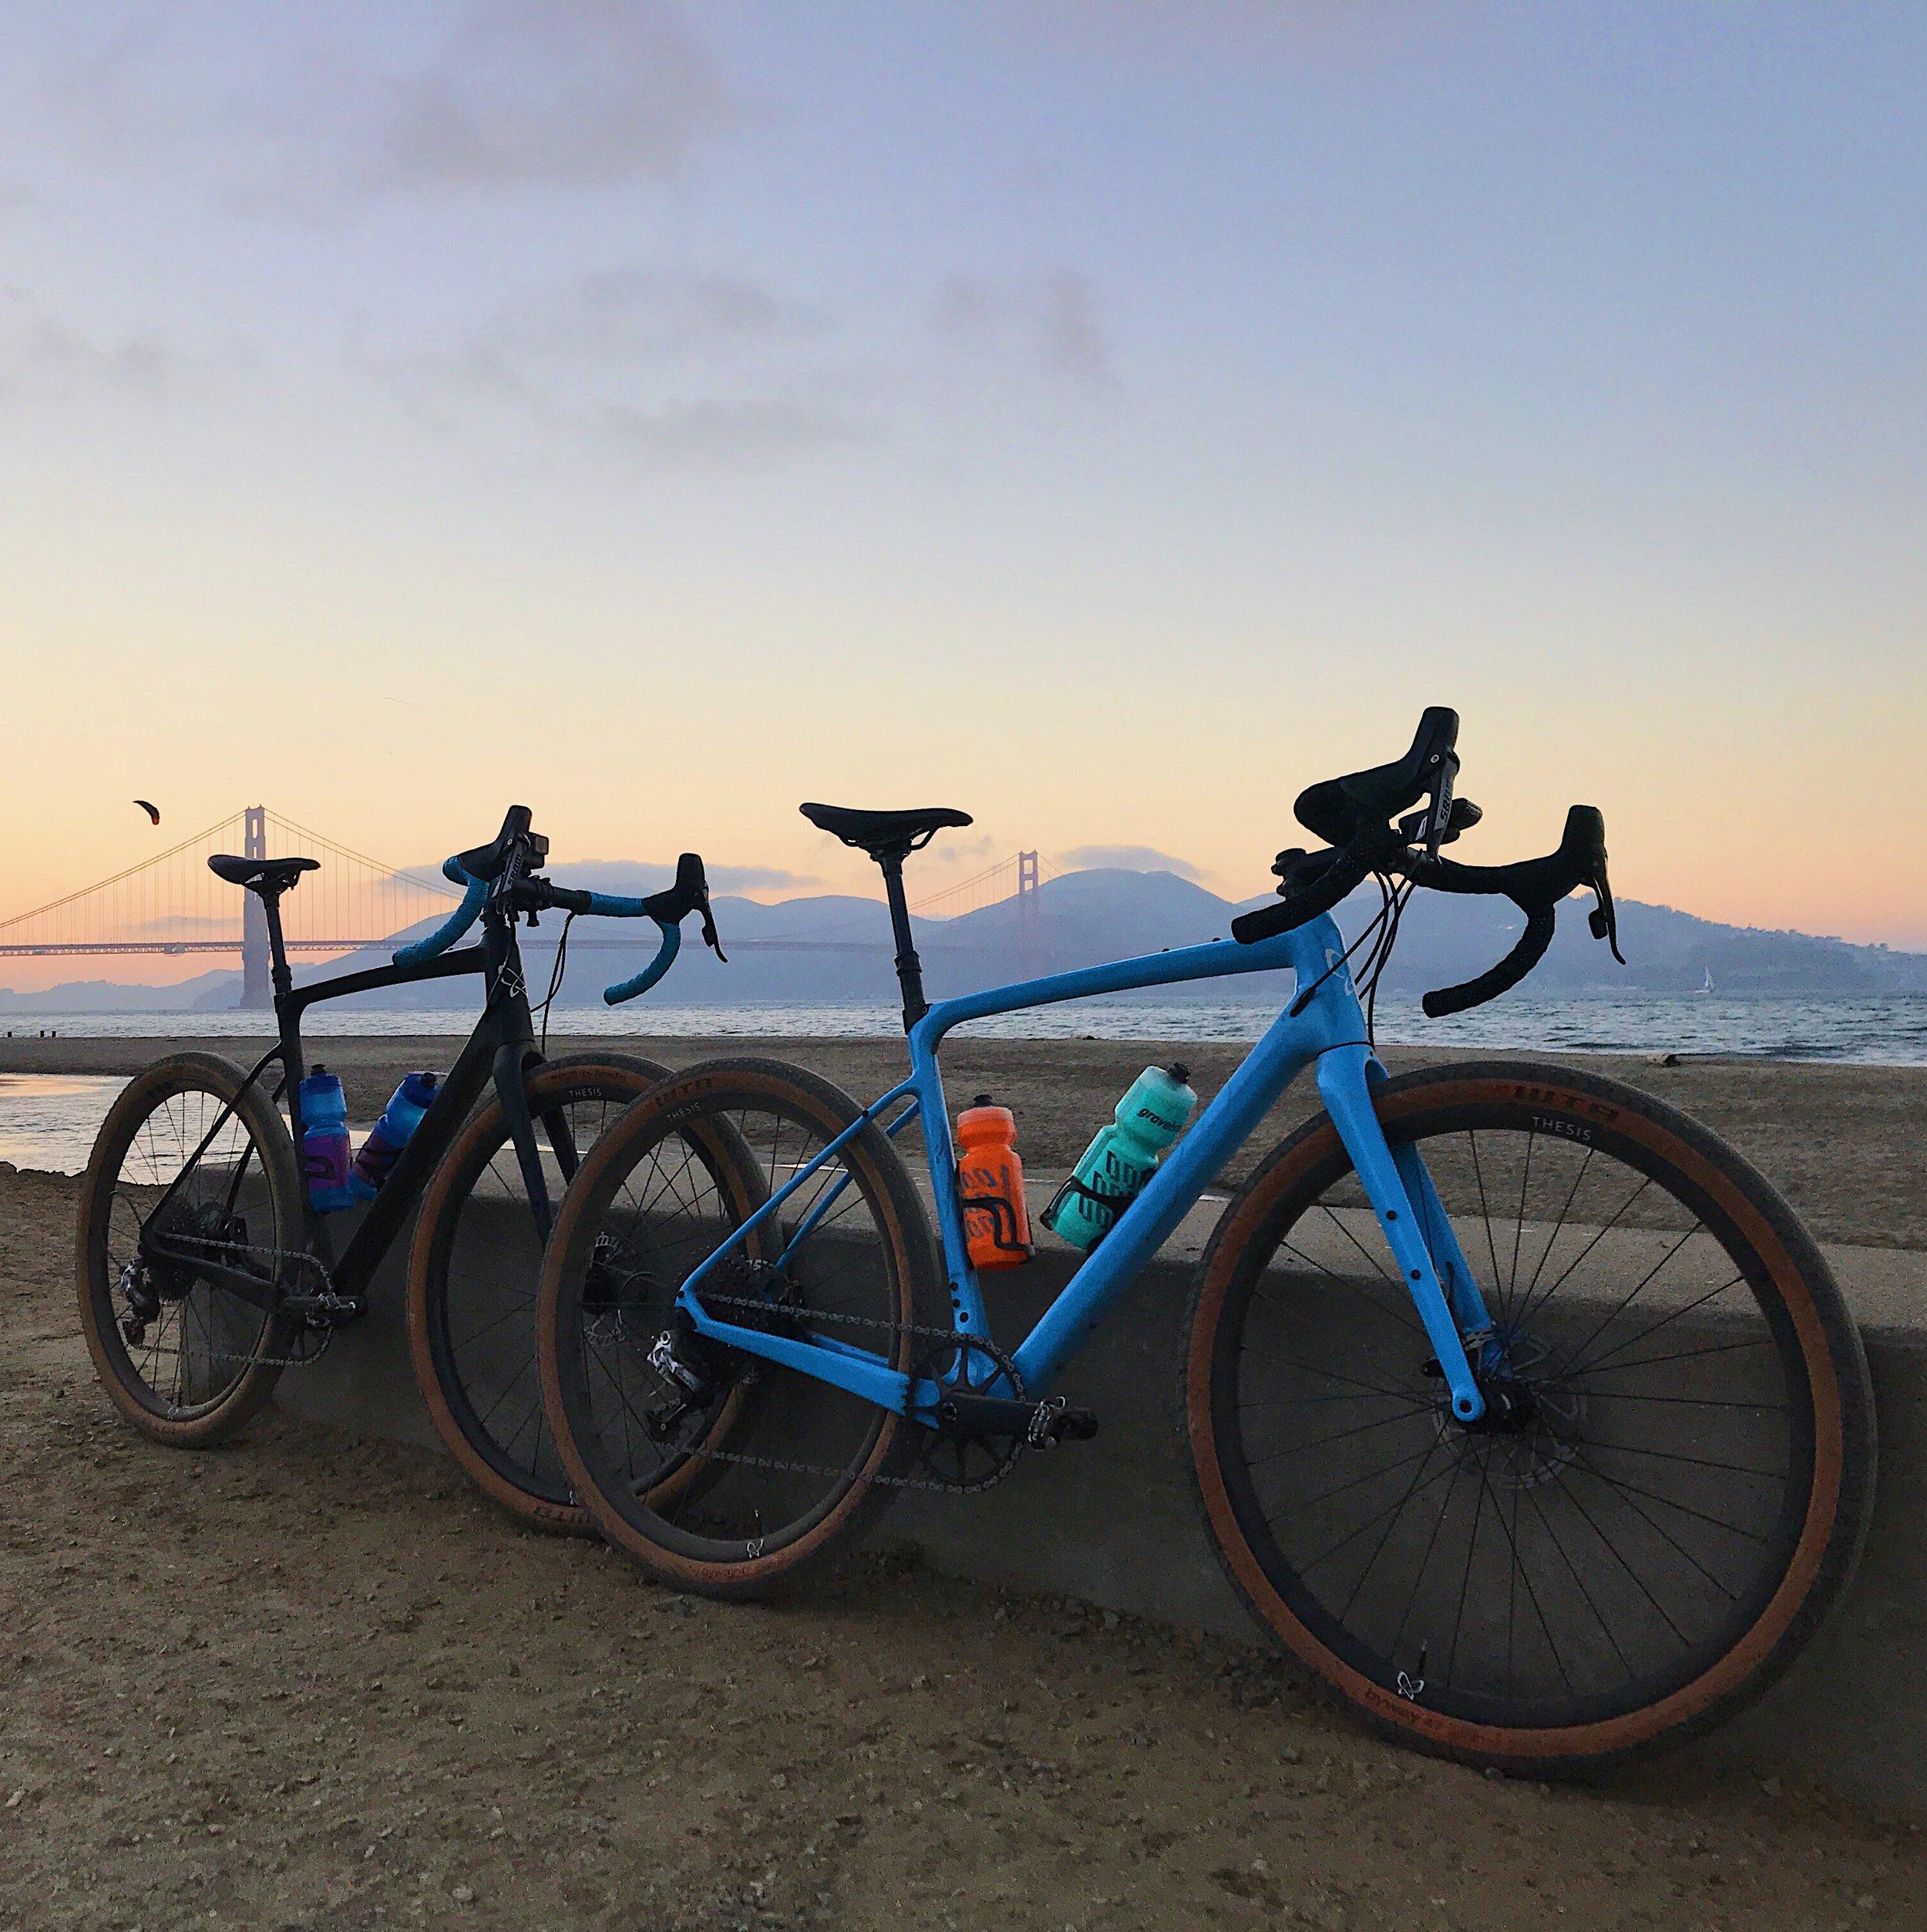 Thesis Gravel Bikes with Gravelstoke